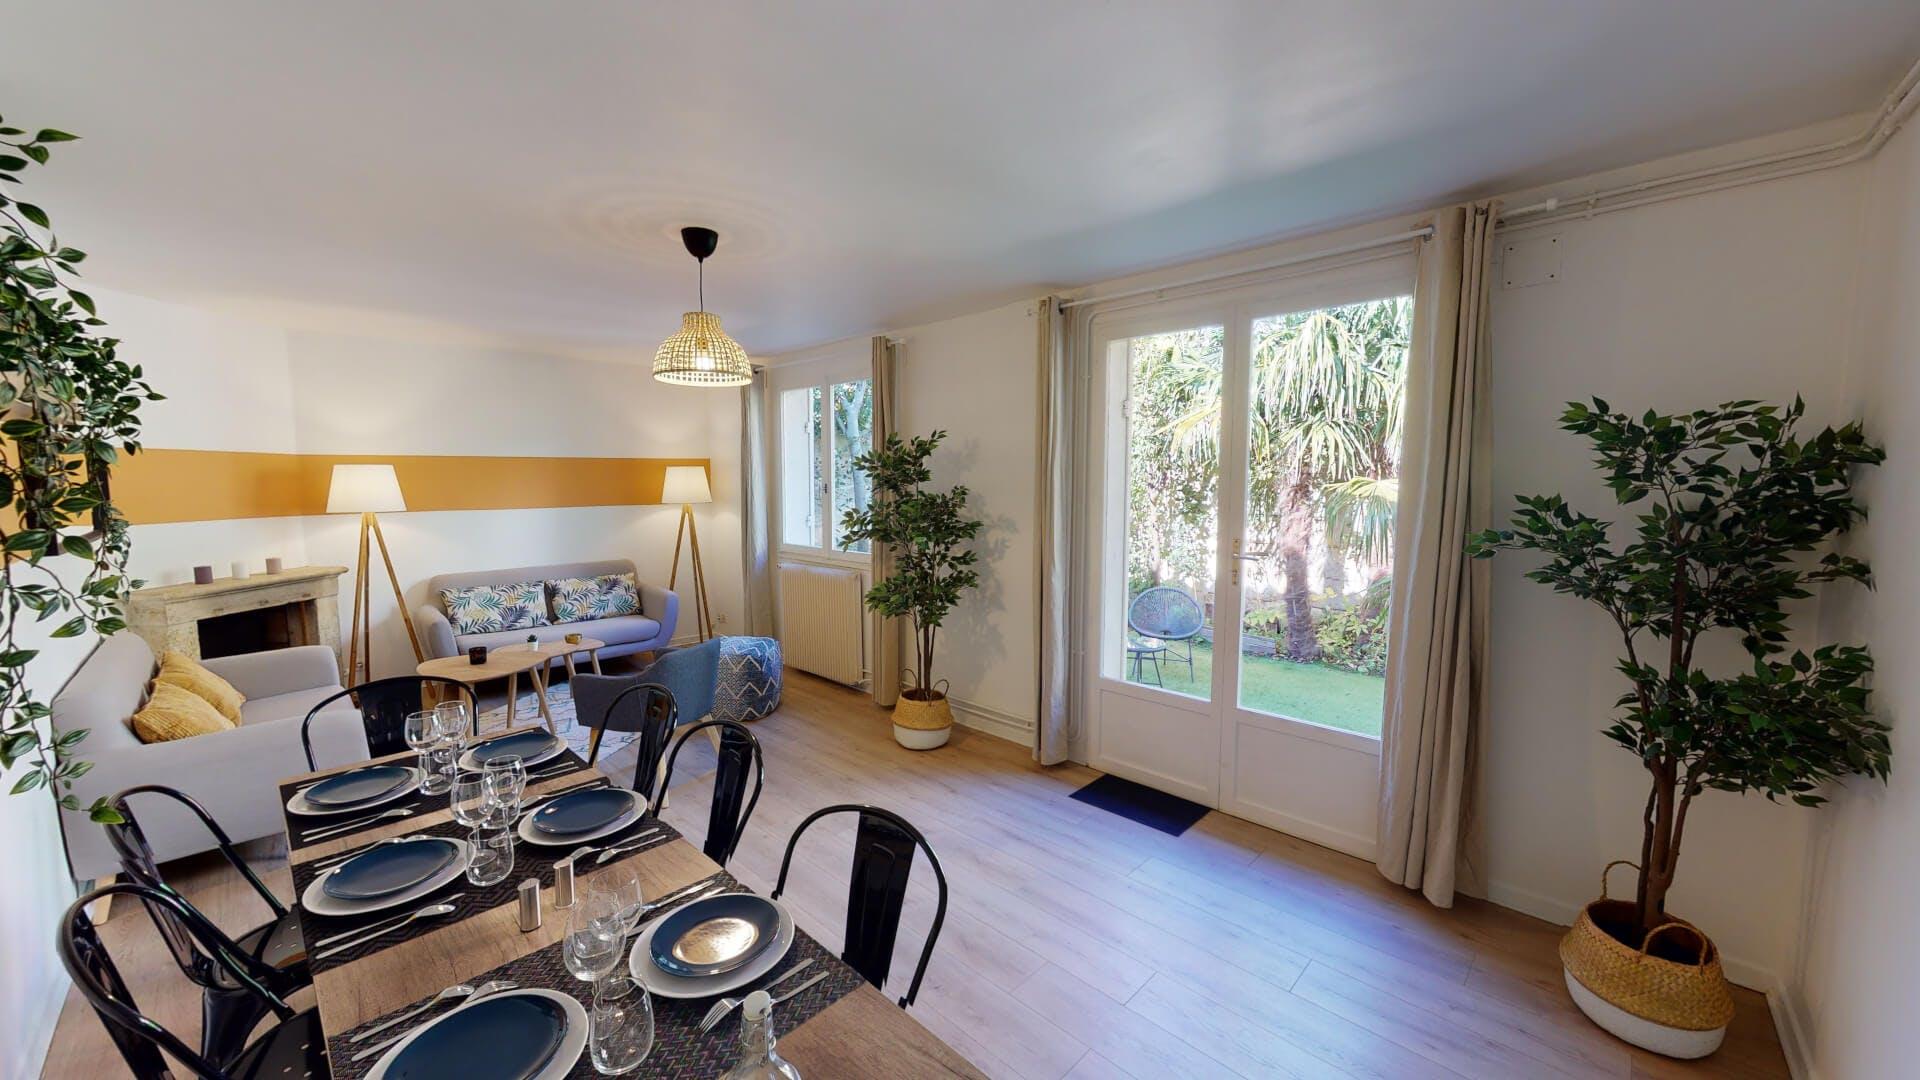 9 Residents   Saint Seurin - Fondaudège   Sunny Oversized House - Incl. Garden Deck